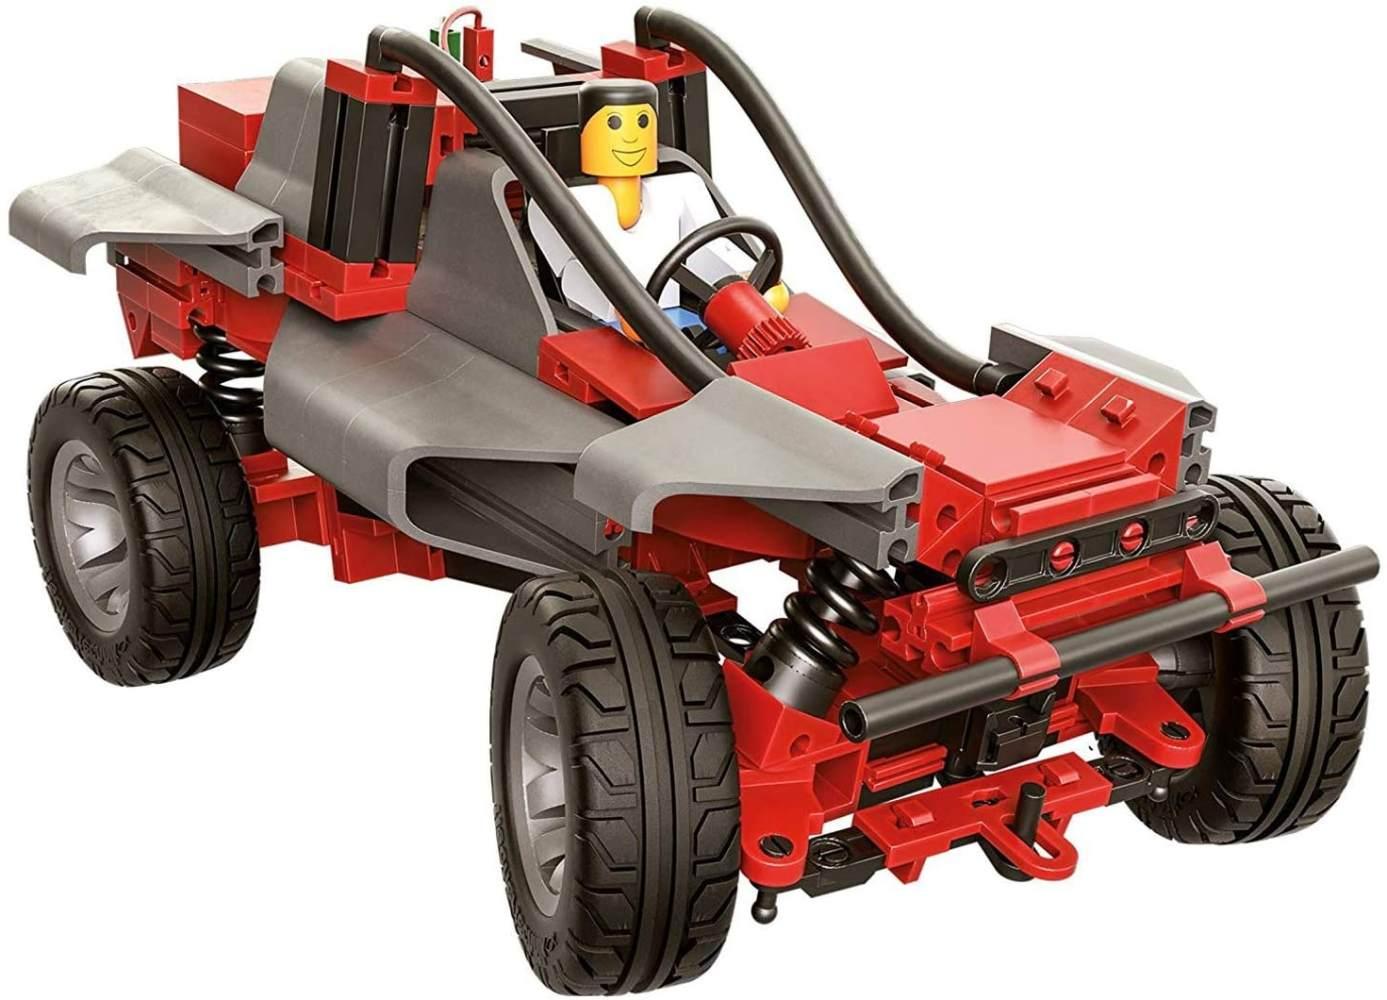 fischertechnik - 540584 ADVANCED BT Racing Set, Konstruktionsbaukasten Bild 1